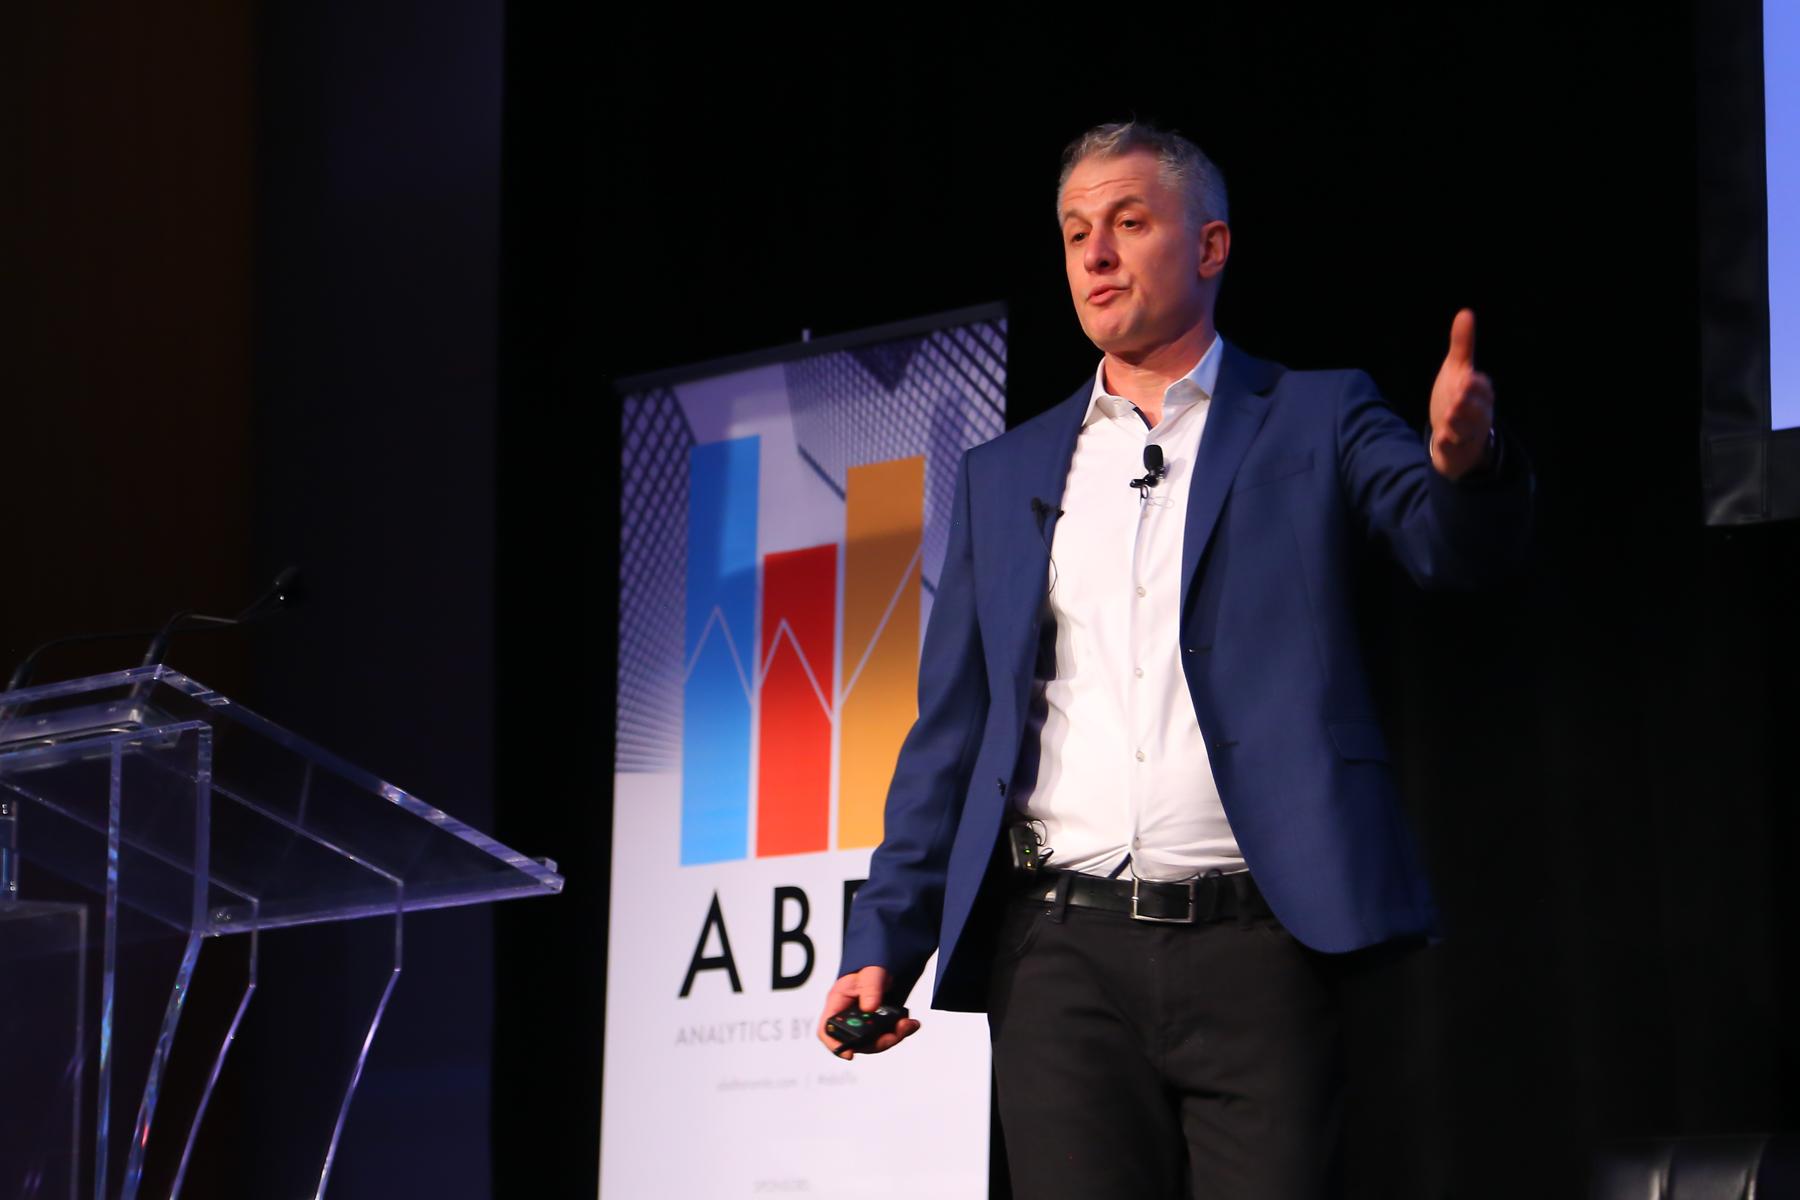 ABD_Conference_2018-076.jpg